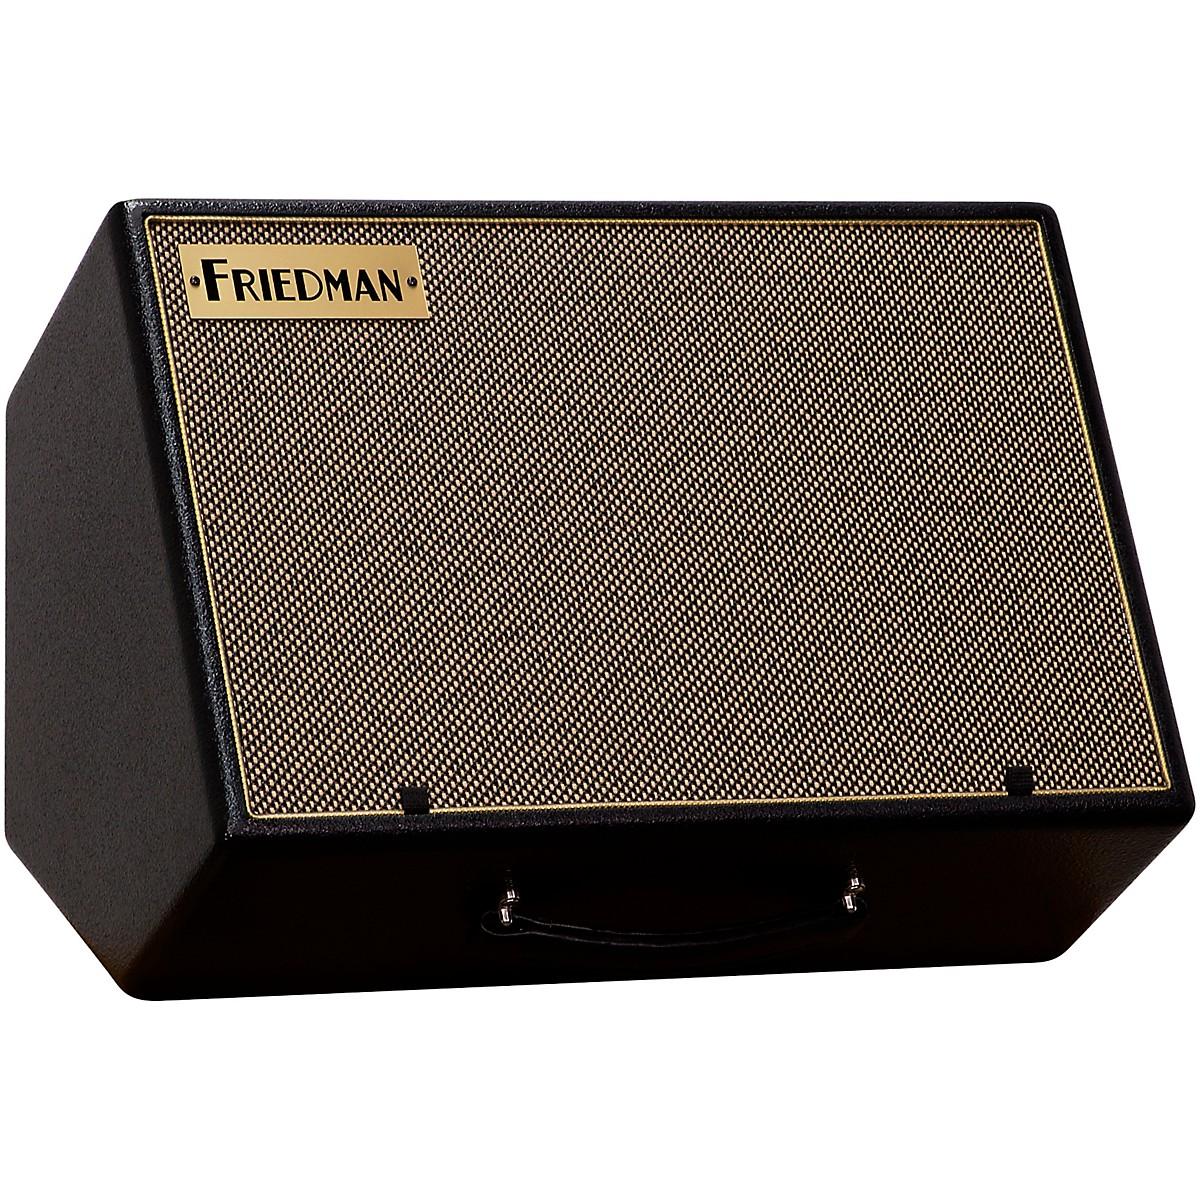 Friedman ASM-10 500W 1x10 Bi-Amp Powered Guitar Monitor